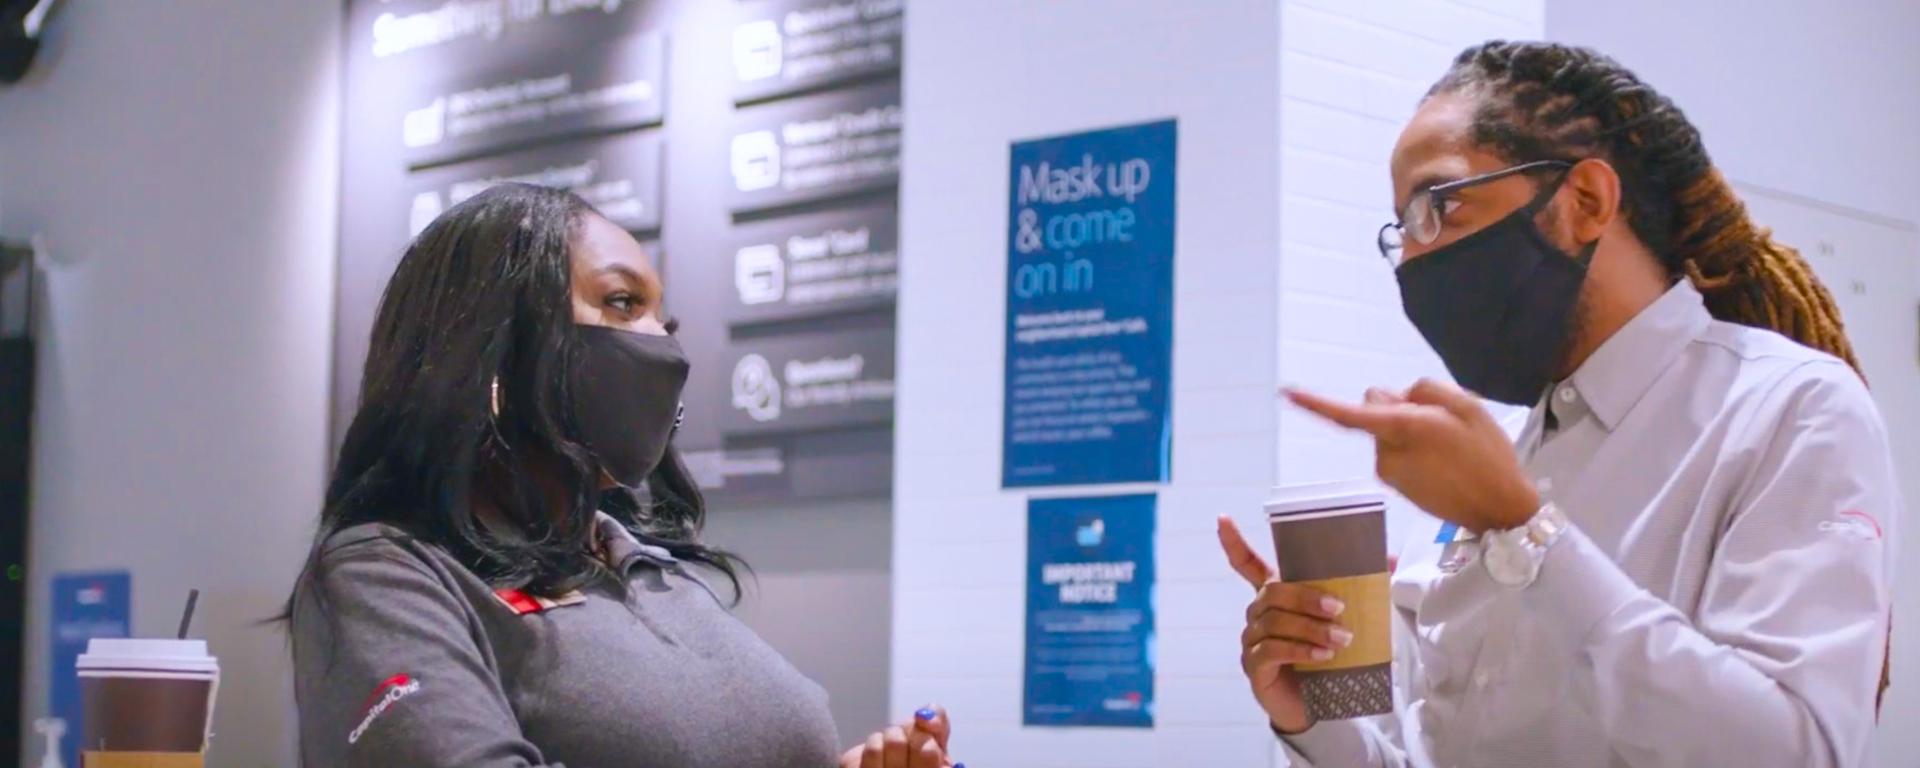 Capital One cafe associate talks to a customer wearing masks